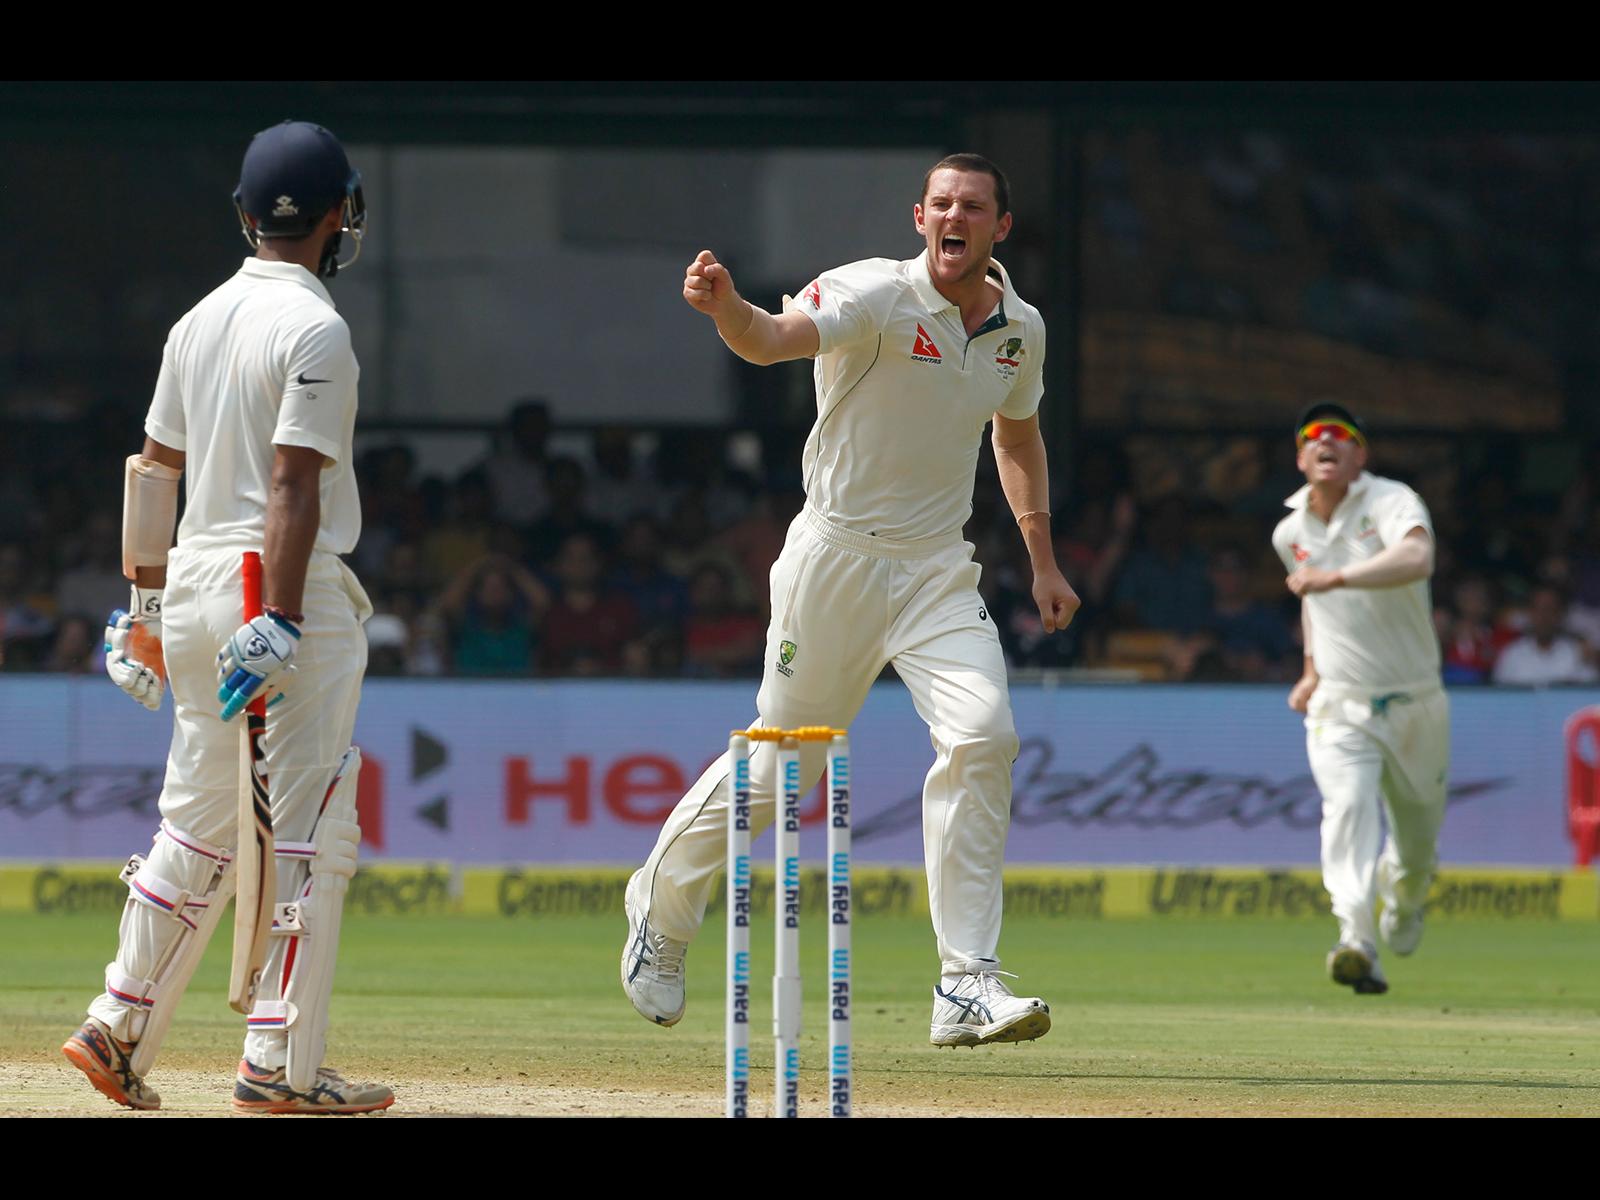 Hazlewood drops despite career best | cricket com au